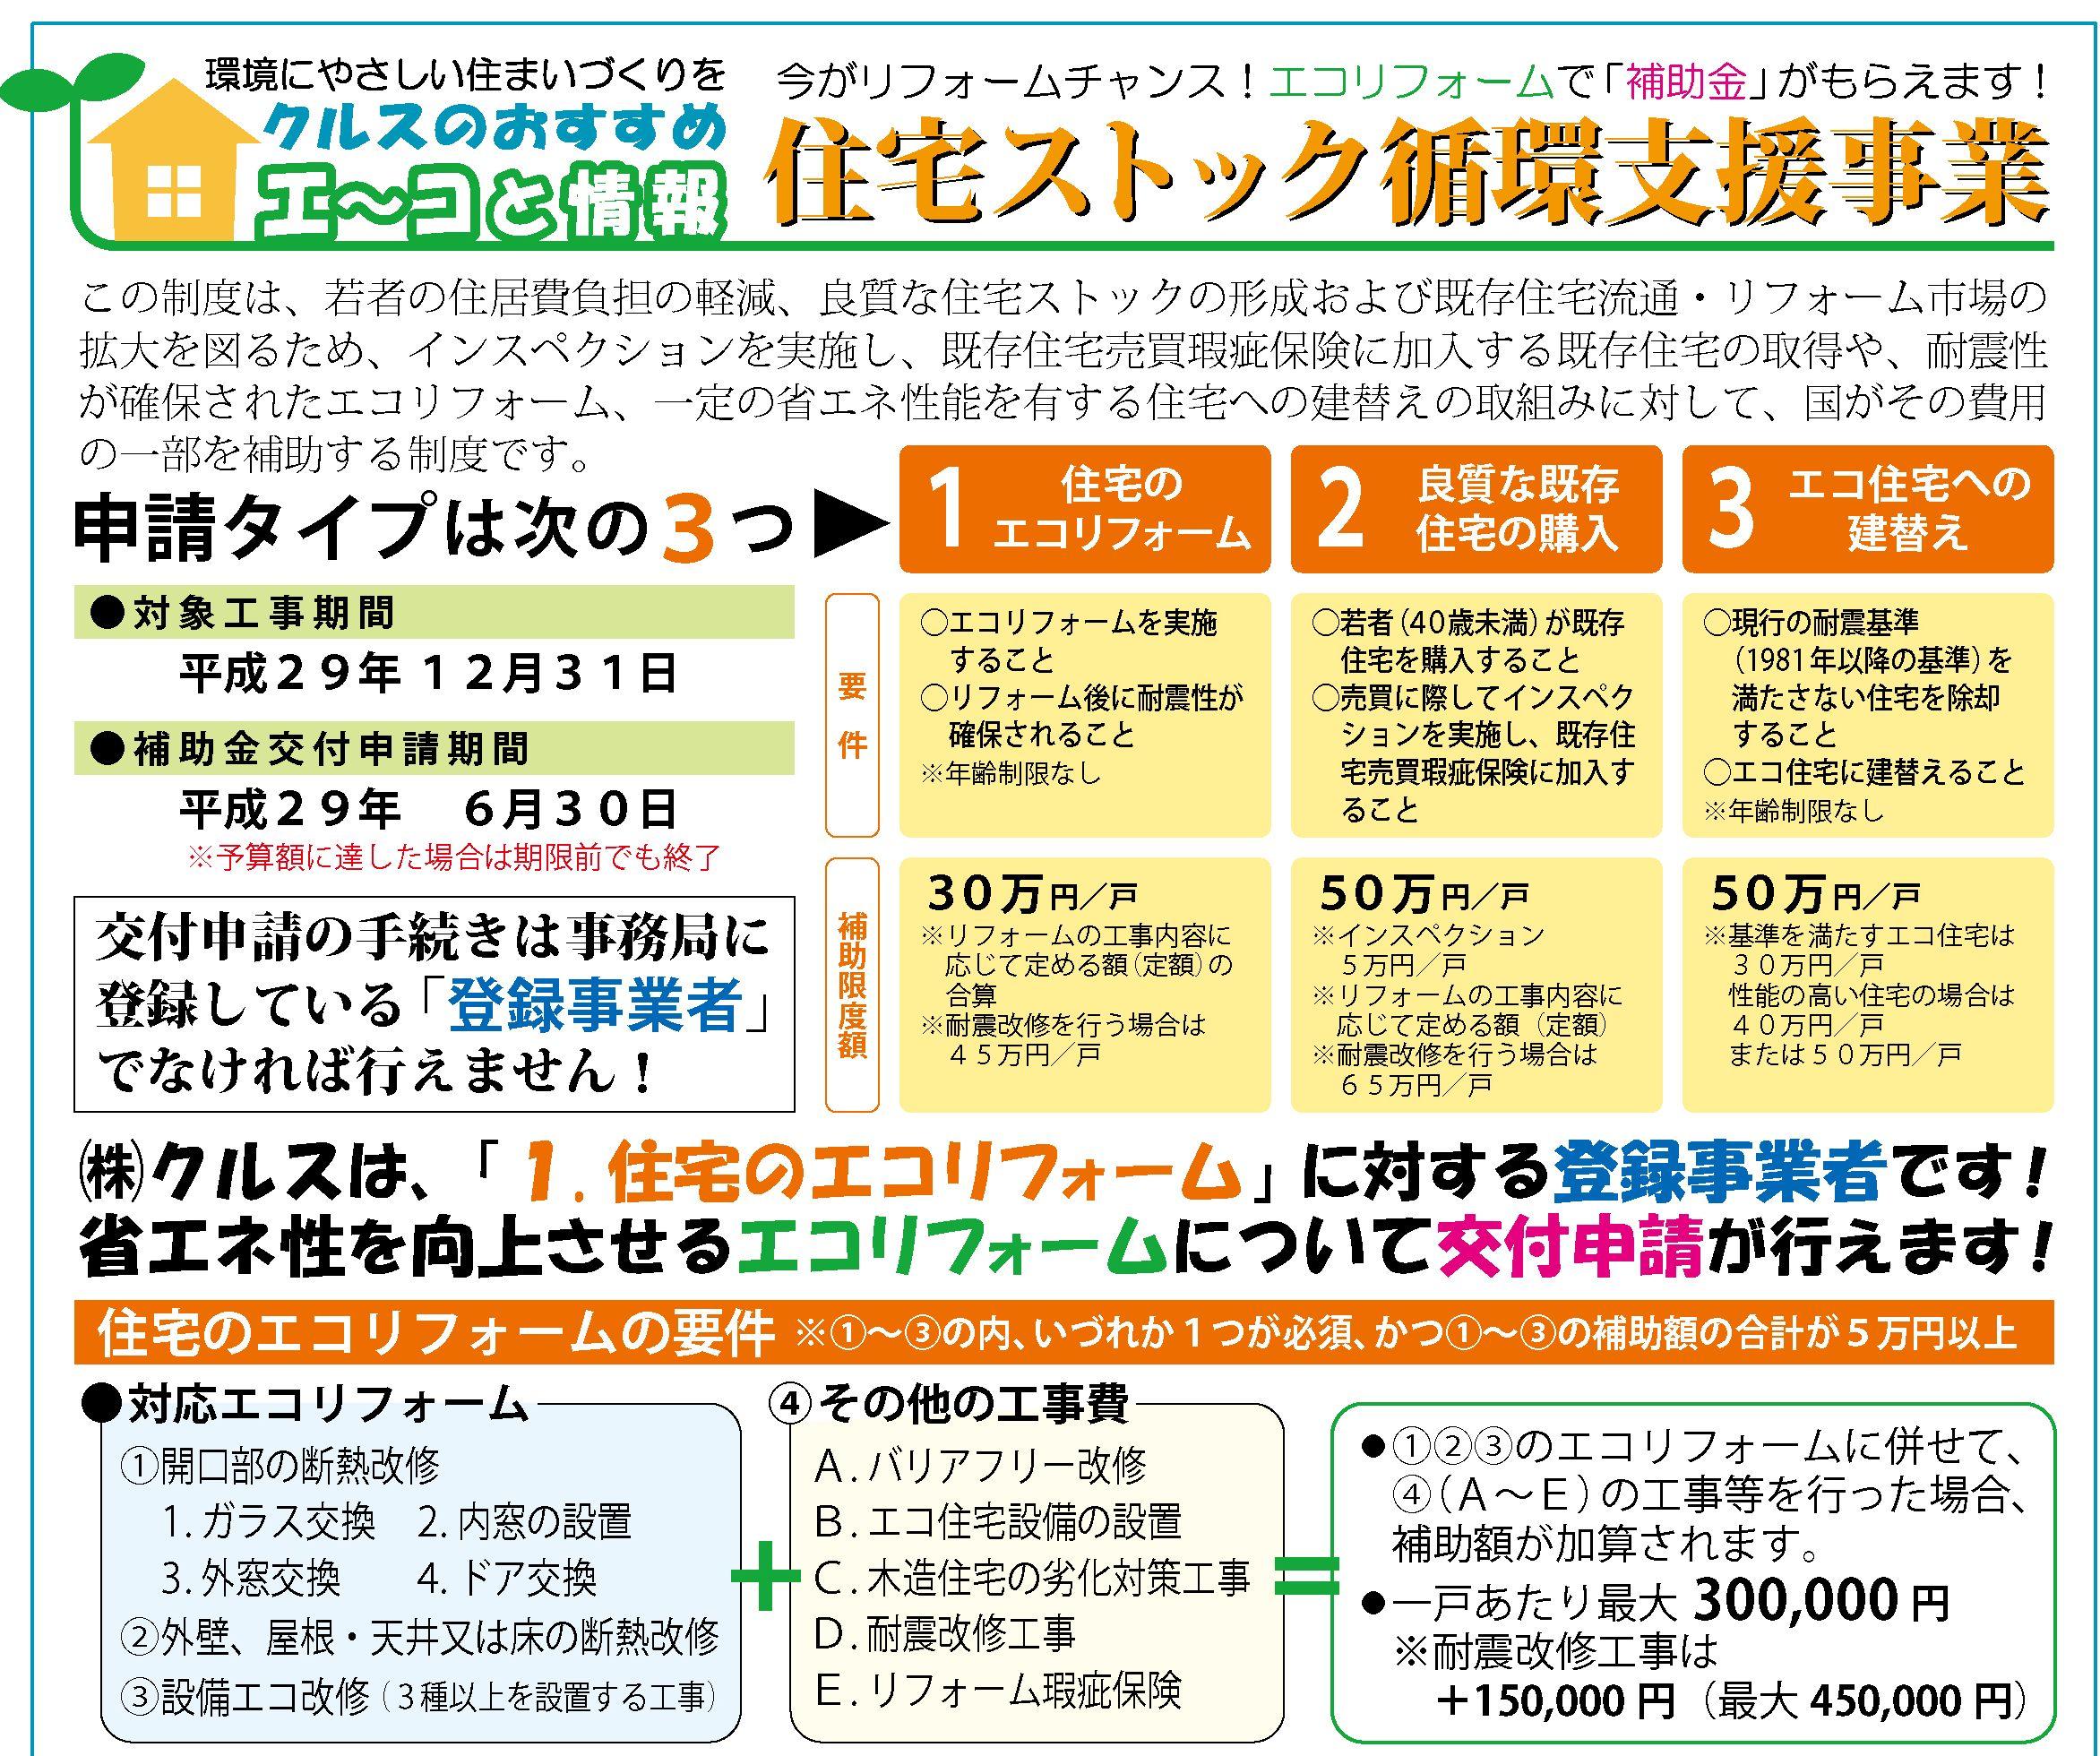 KuraSi-natu-sin102-04.jpg